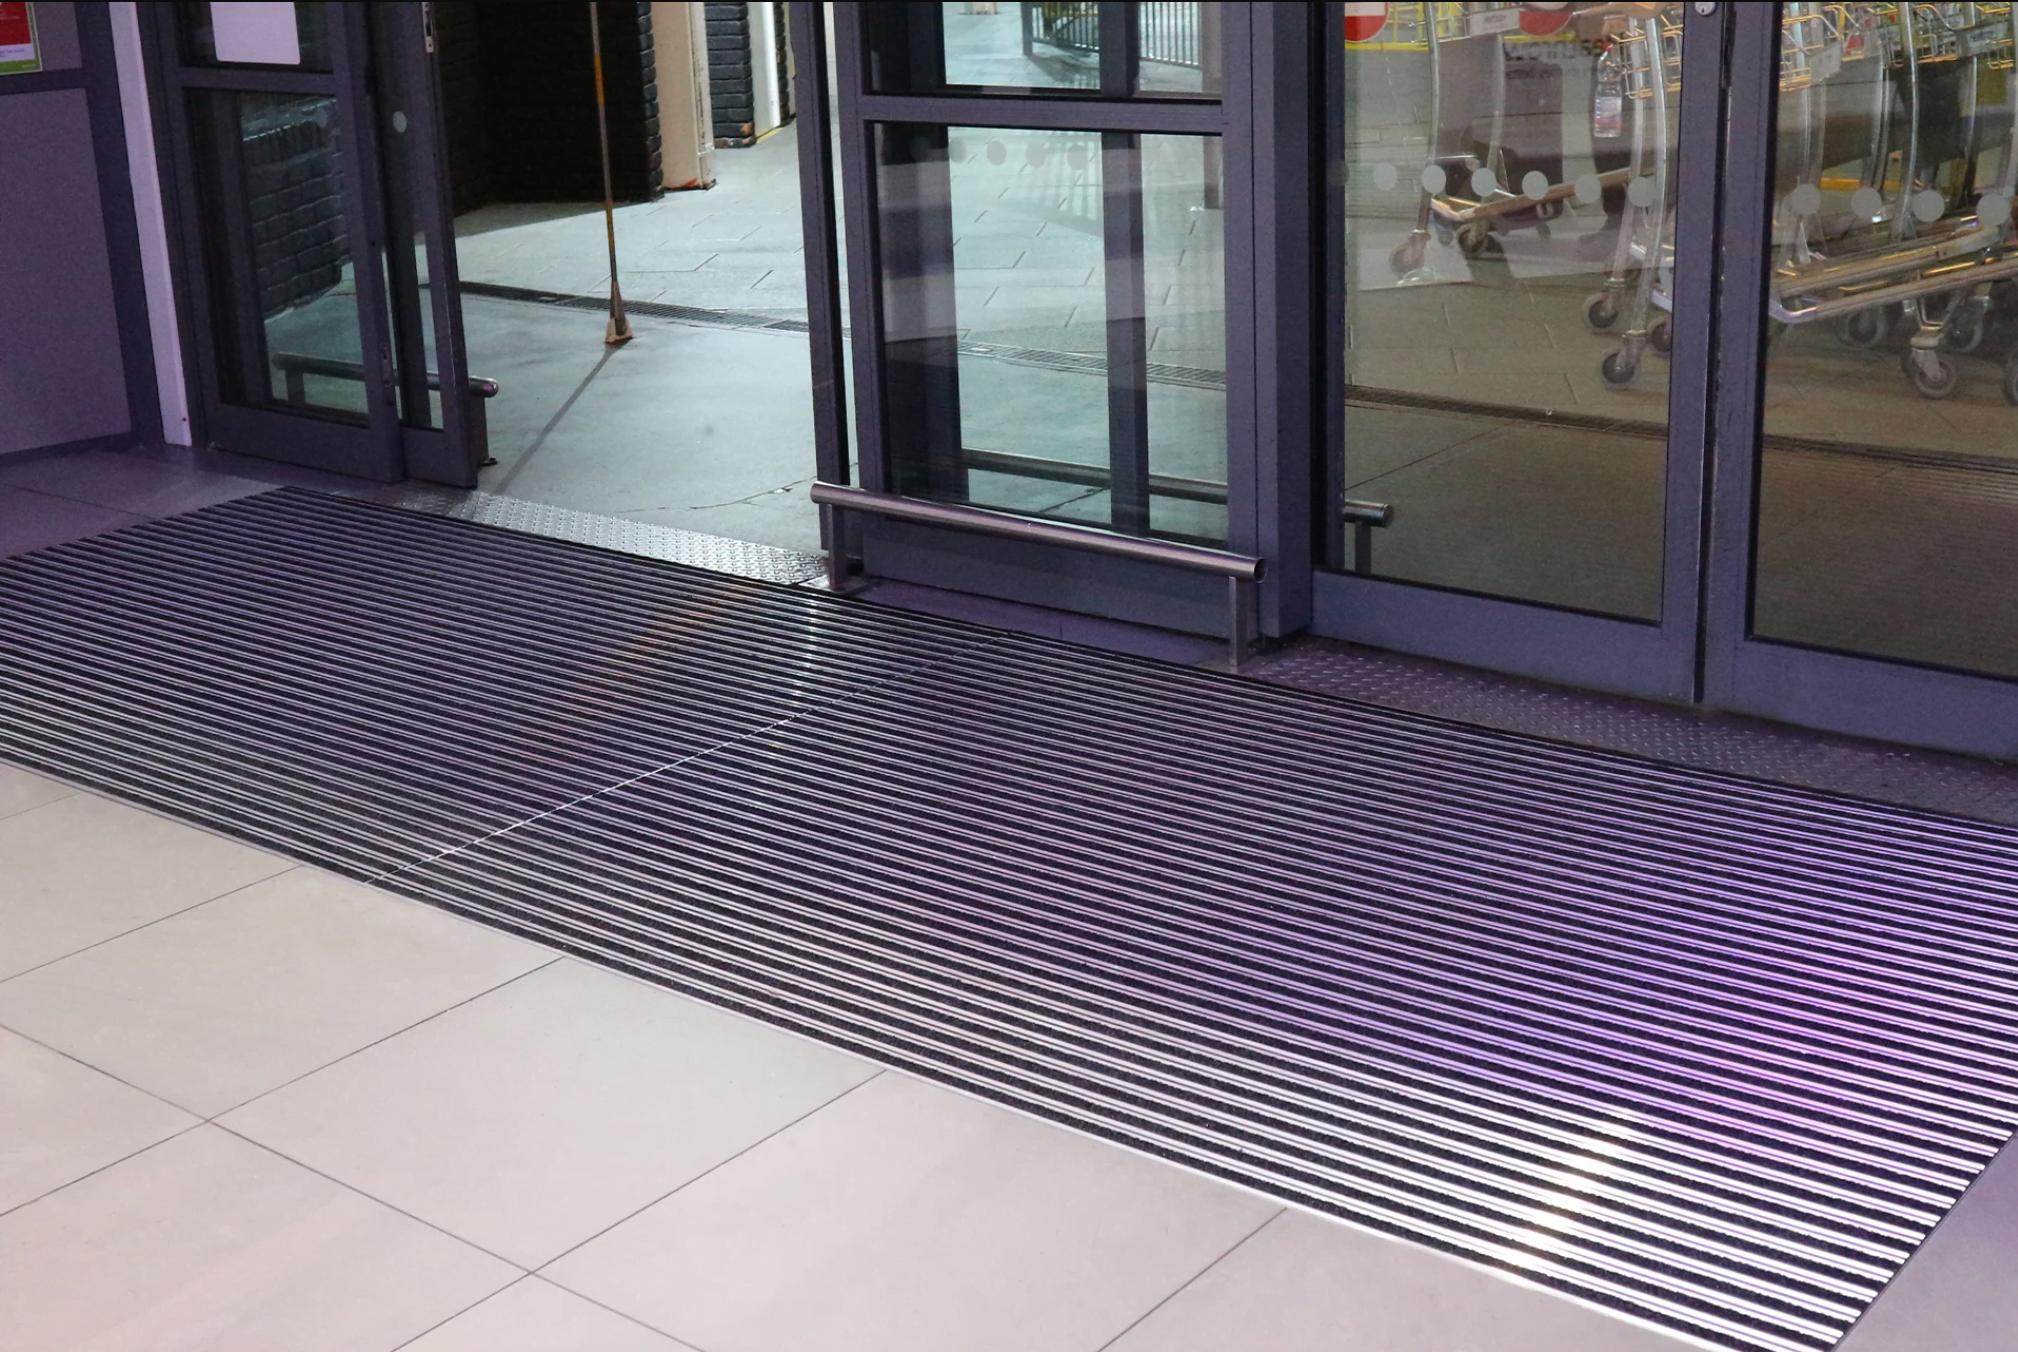 bus station entrance matting